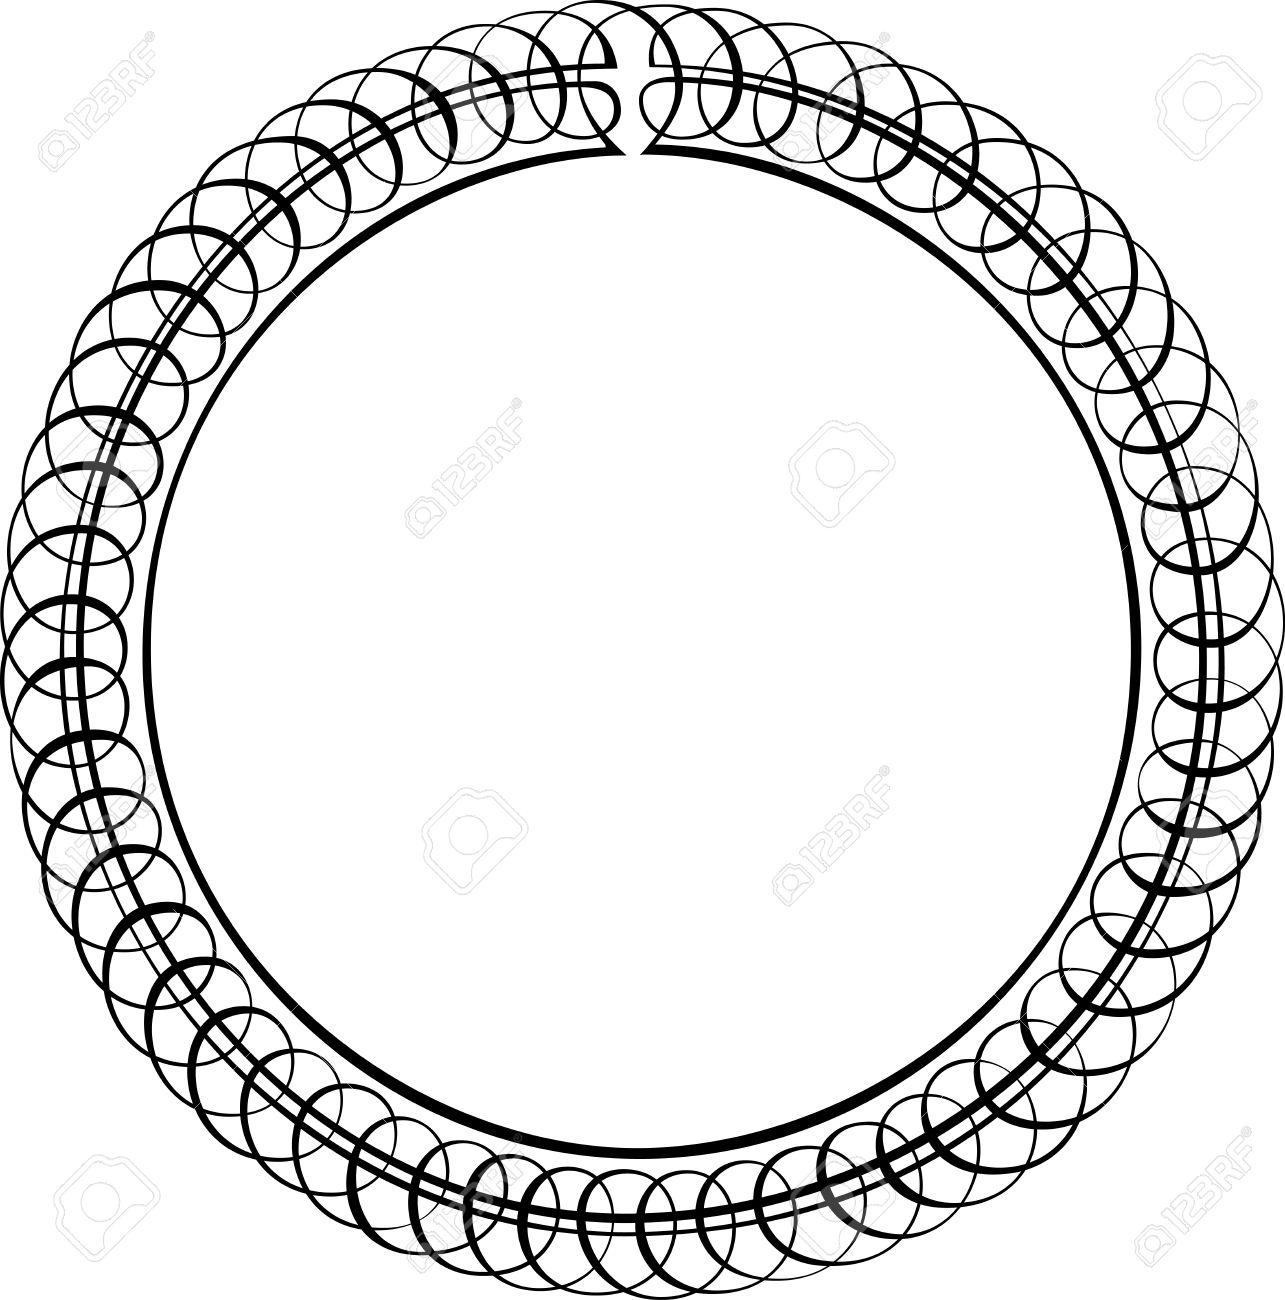 1285x1300 Calligraphic Vector Design Border, Circle Shape Royalty Free